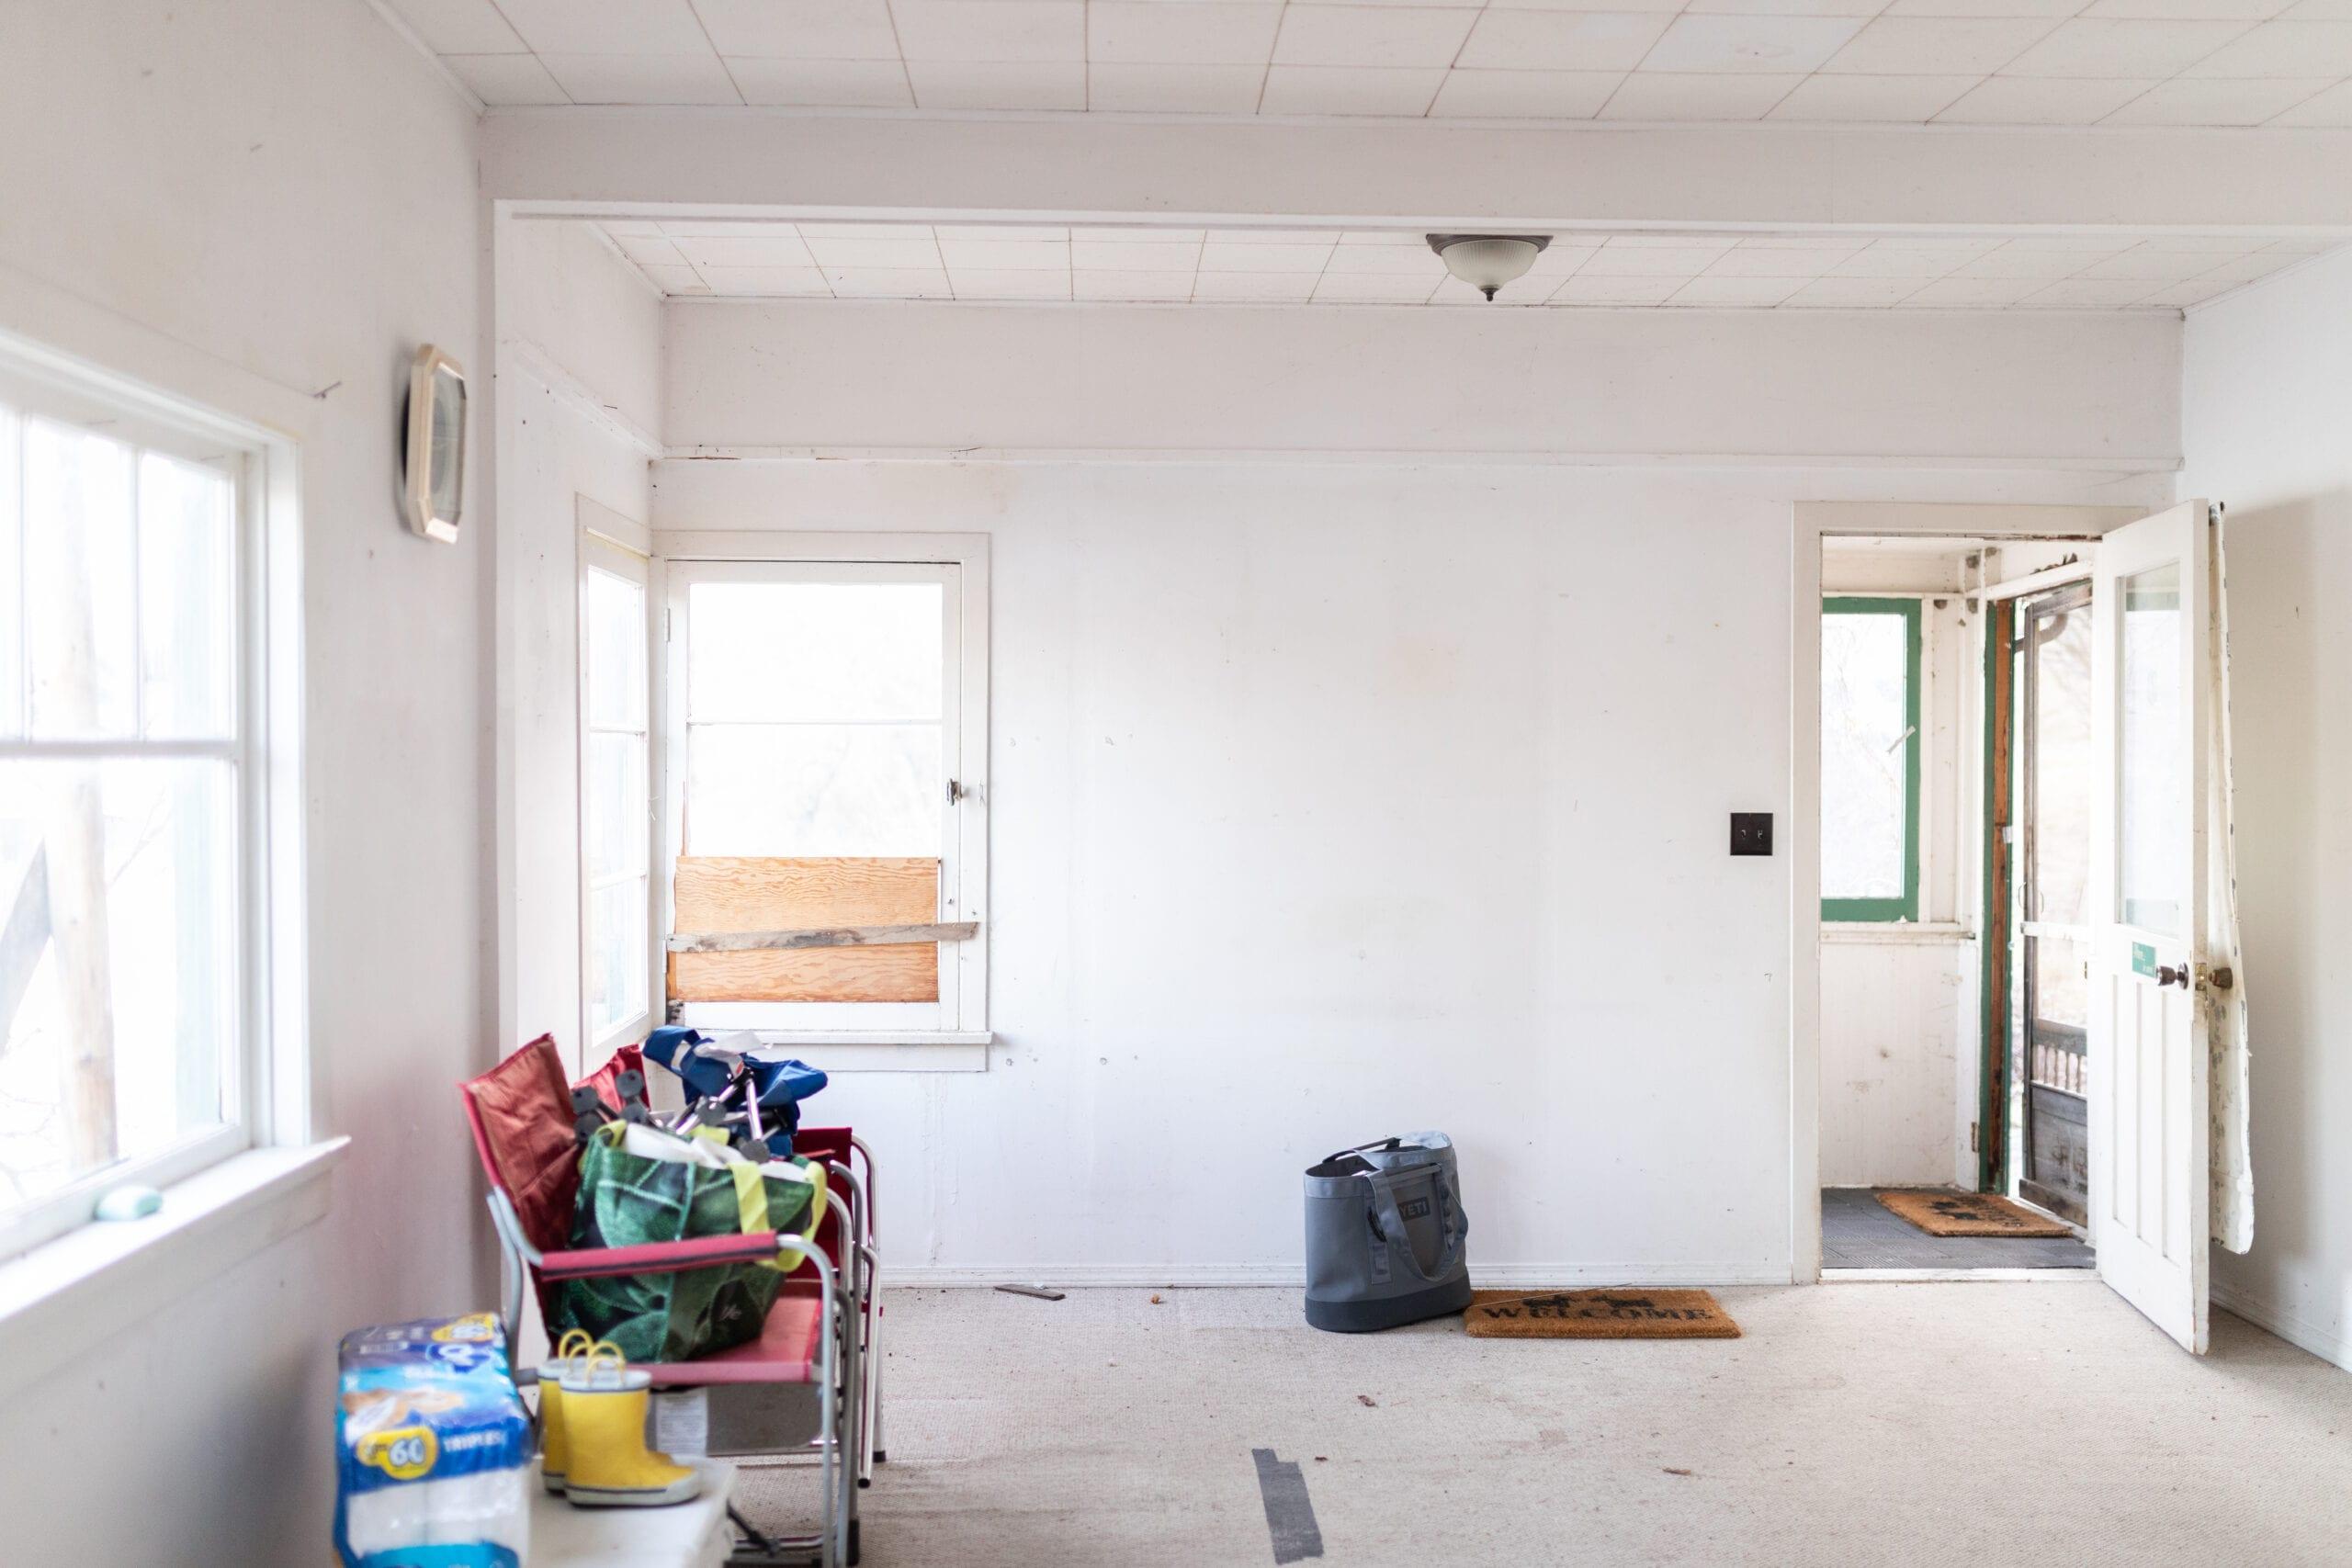 Jillian Harris' ranch house Living Room Before Photo